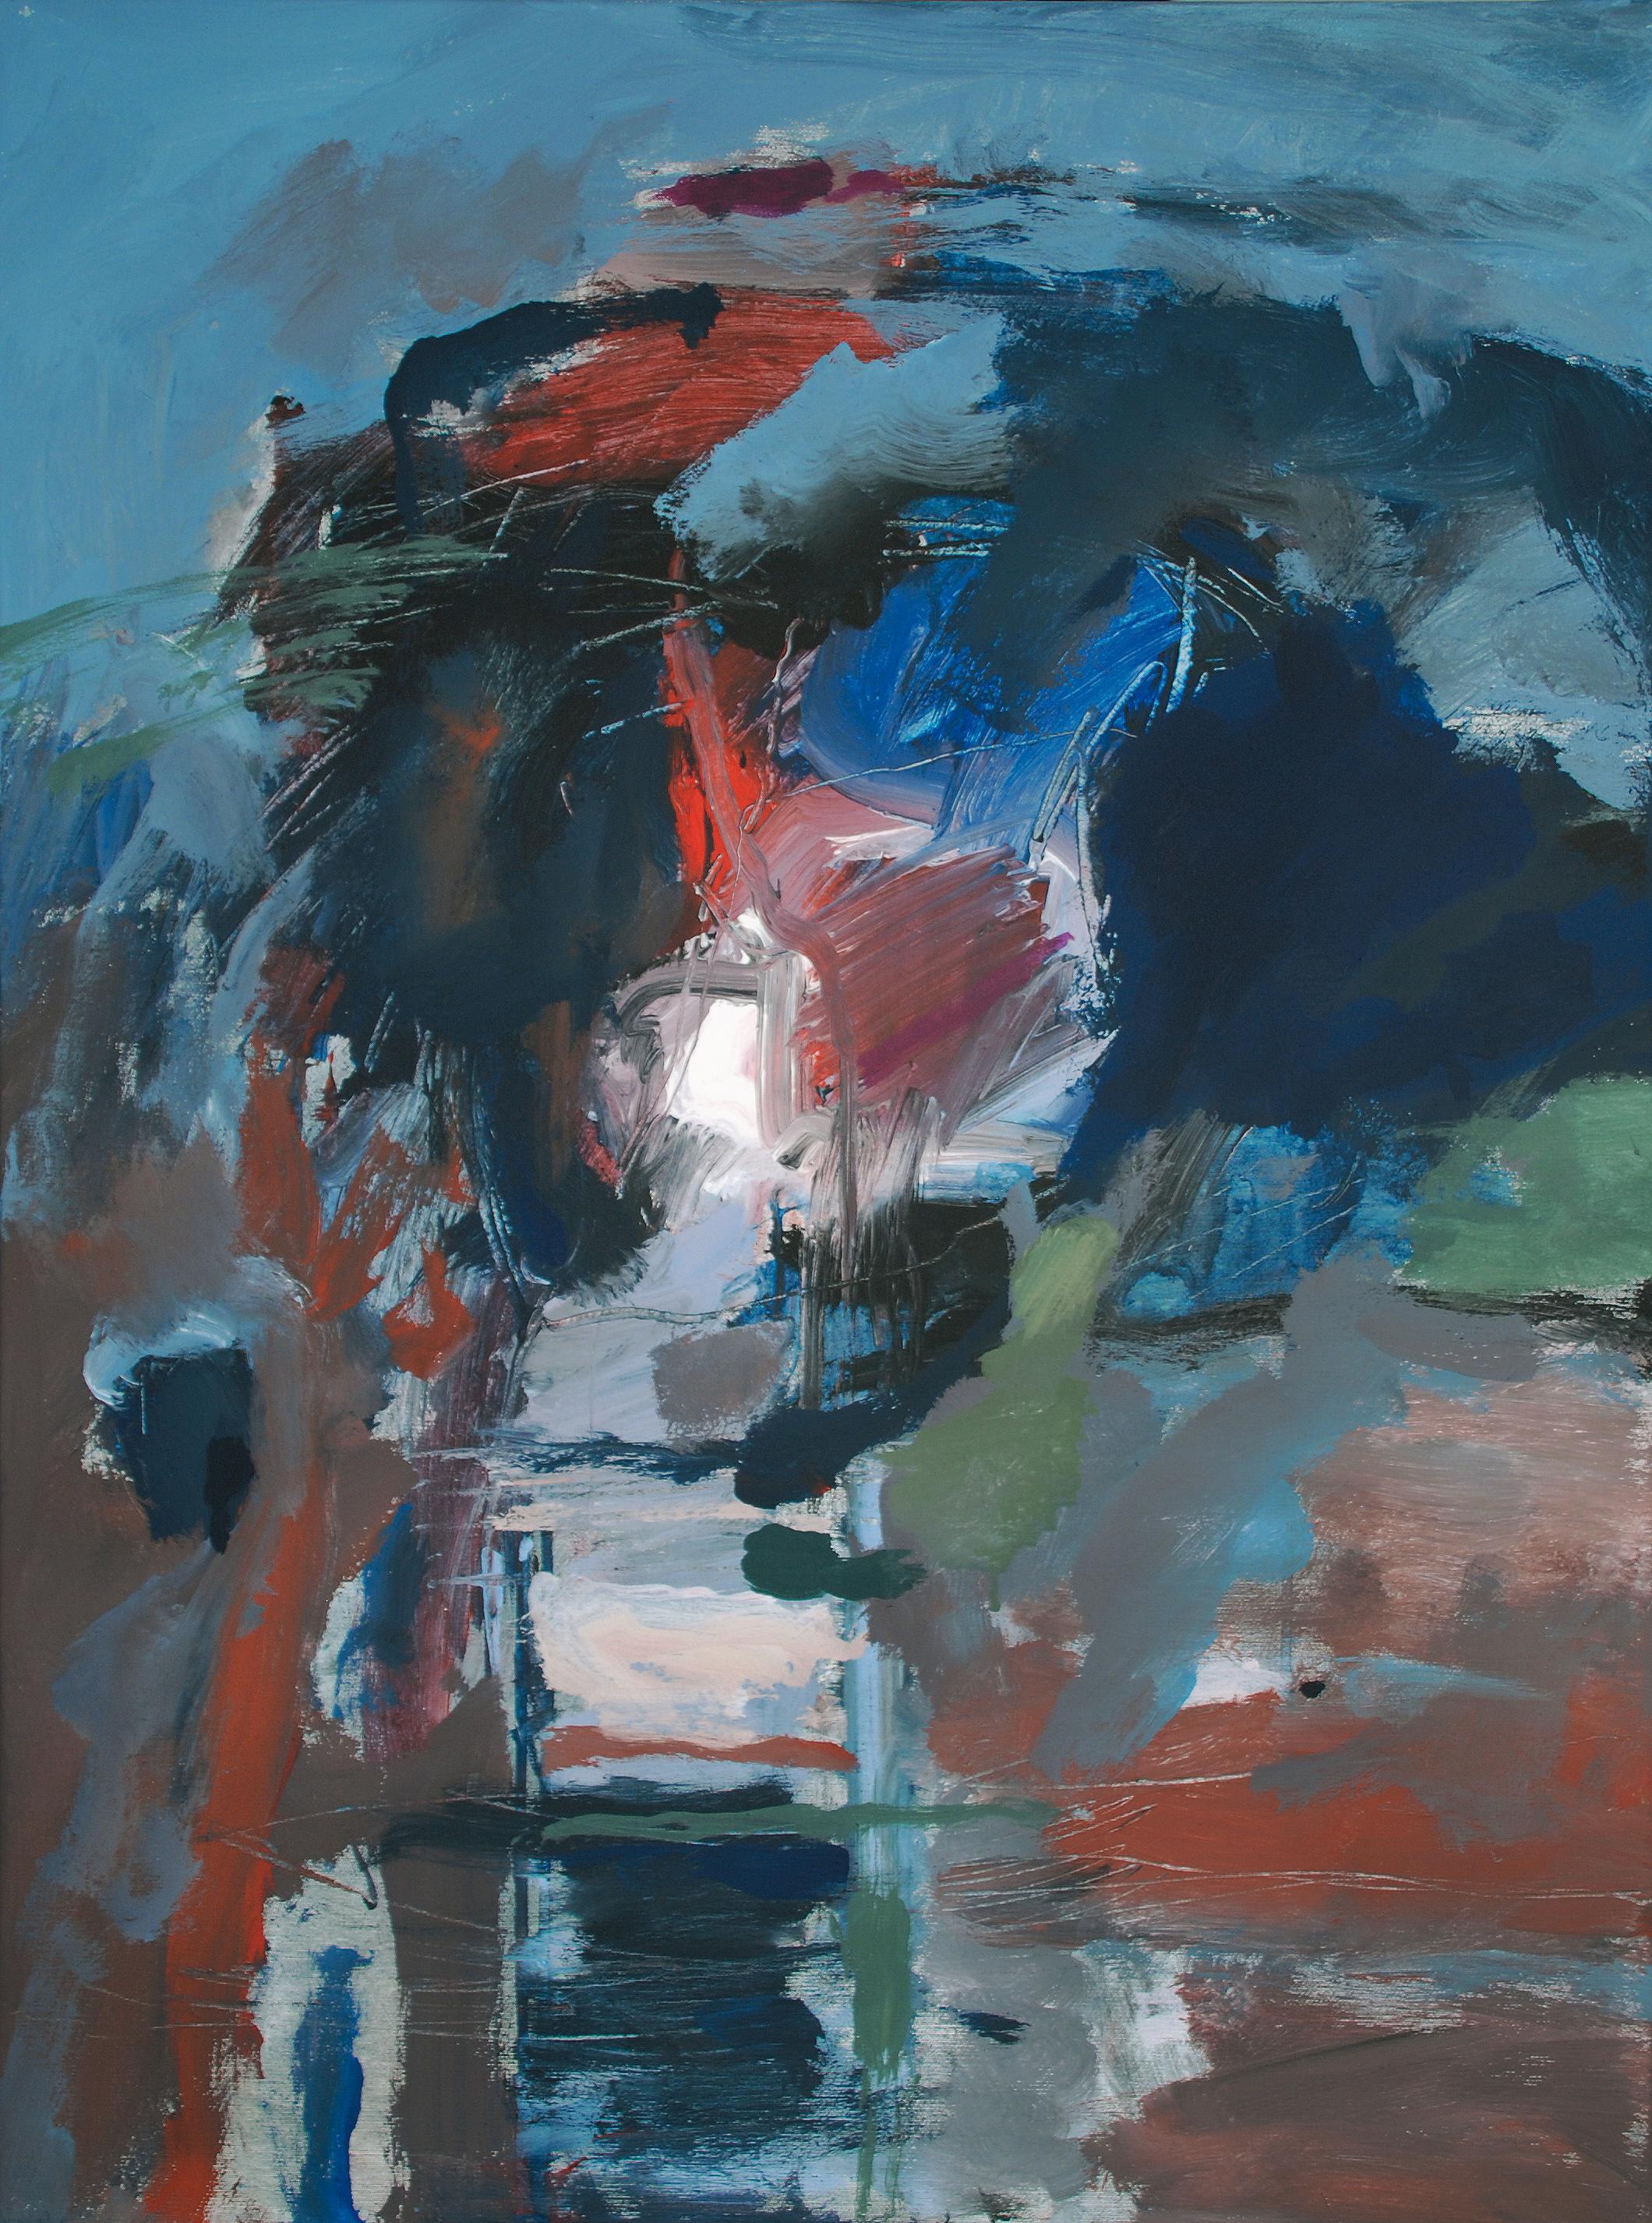 9. motiv, 80 x 60 cm, acryl/leinen